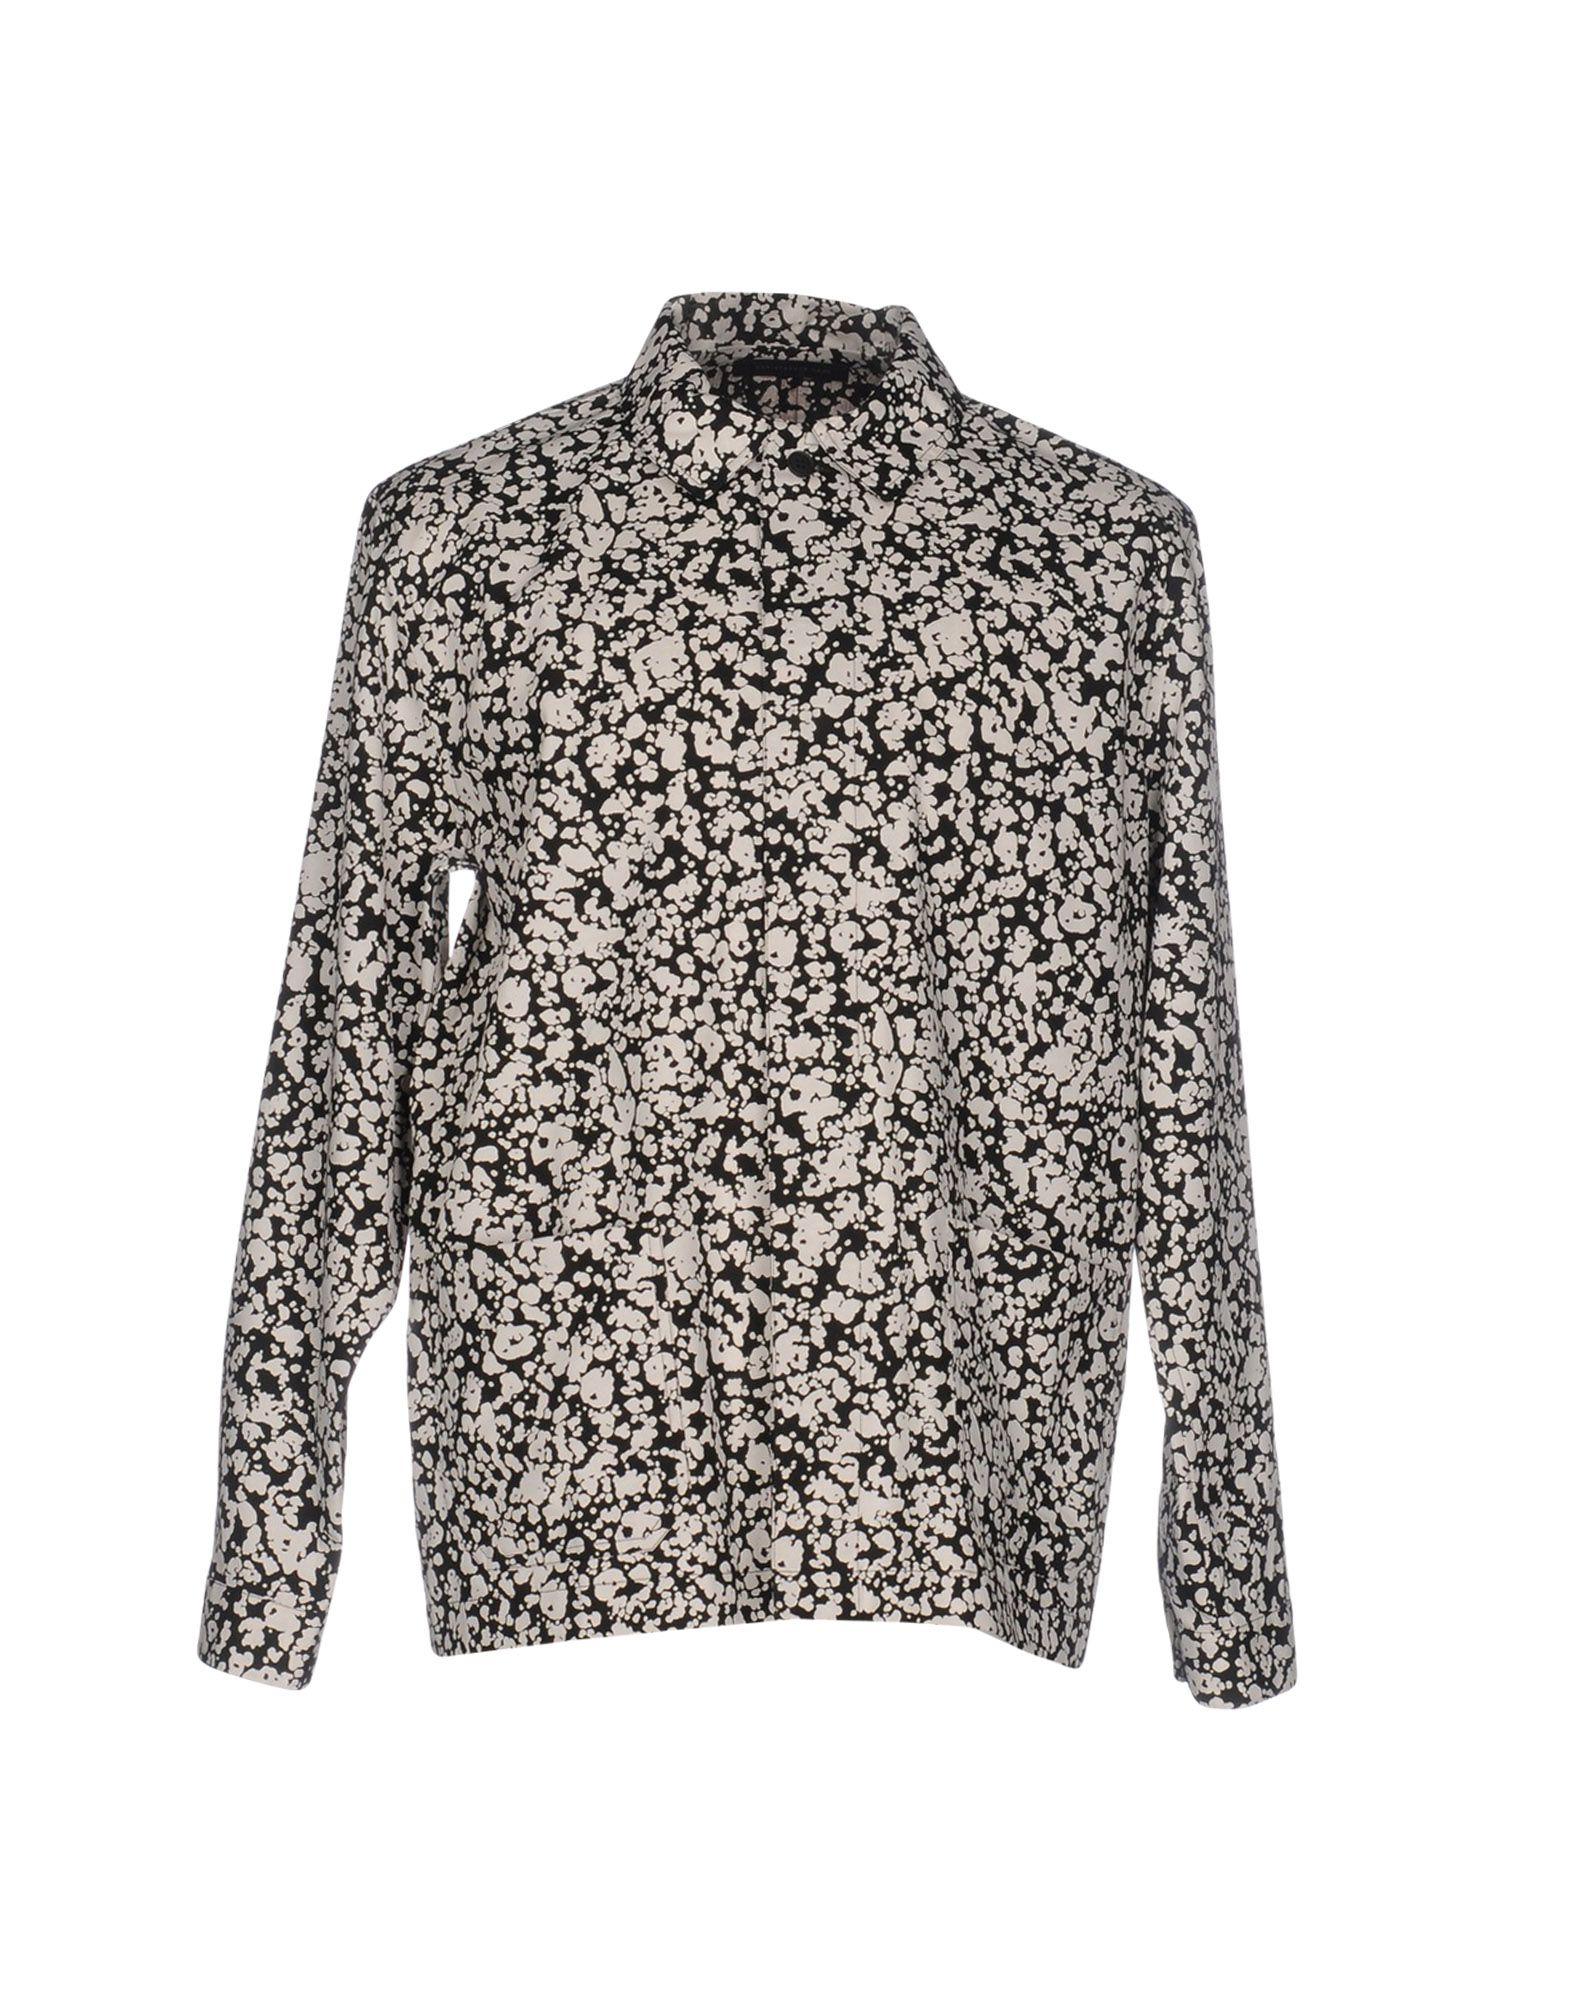 Camicia Fantasia Christopher Kane Uomo - Acquista online su